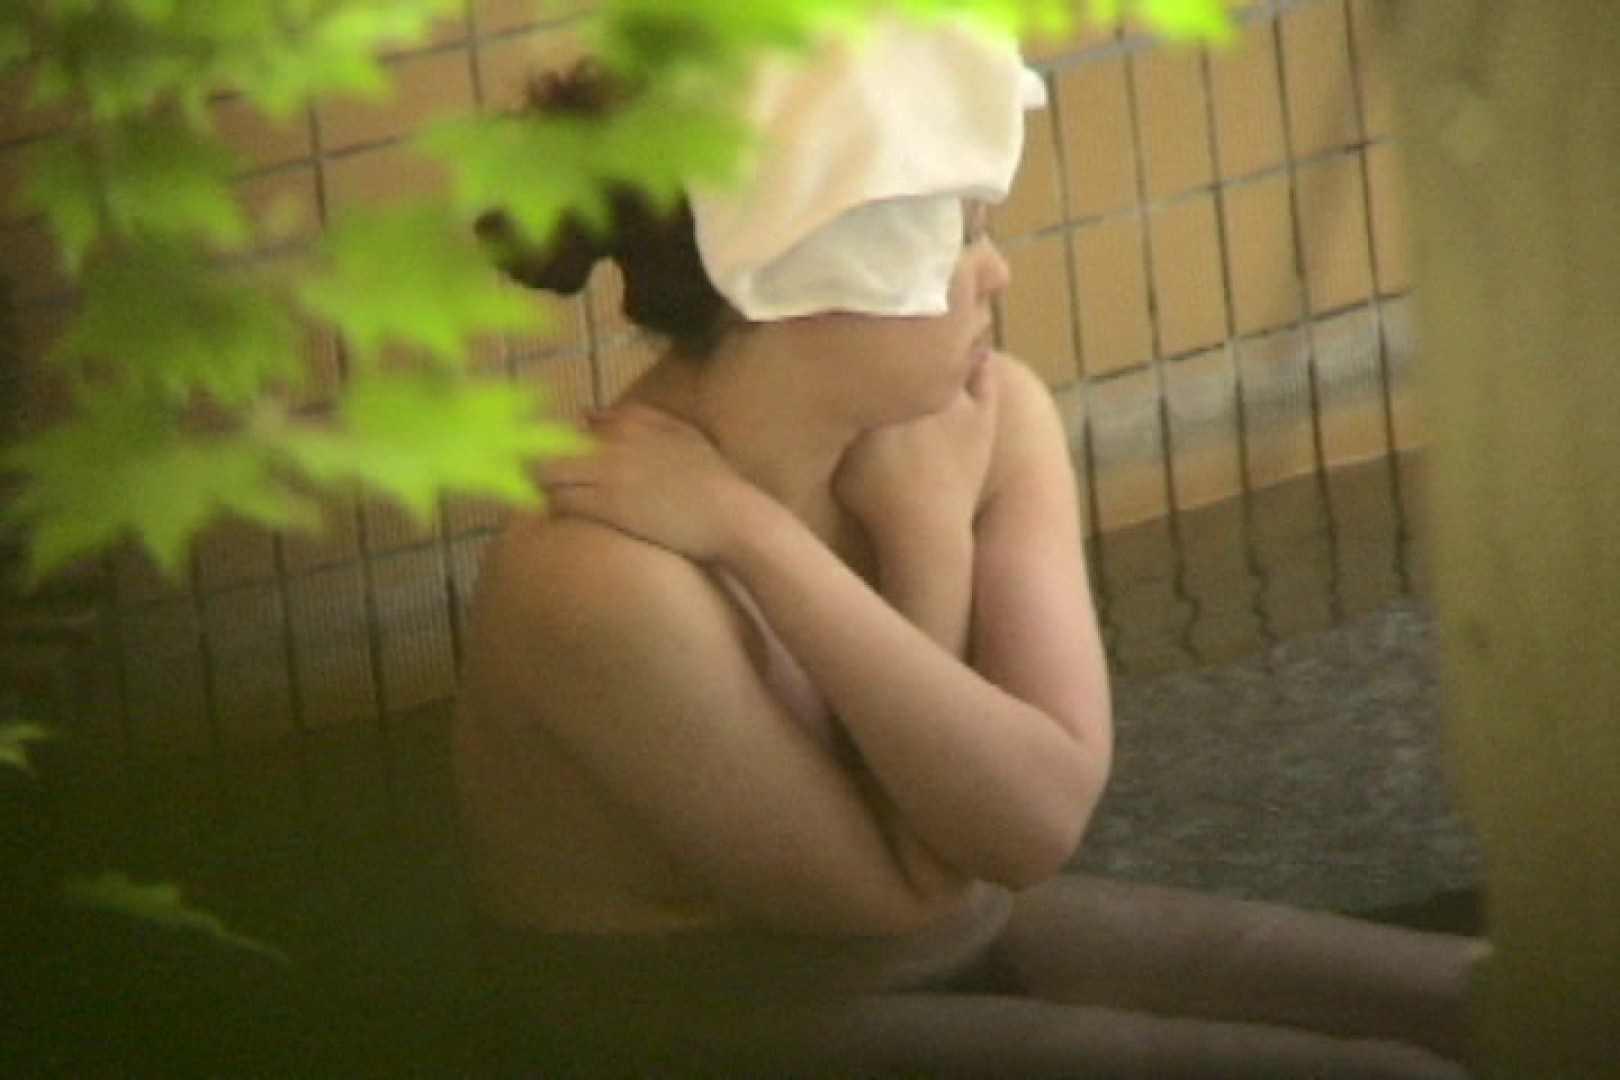 Aquaな露天風呂Vol.456 盗撮師作品 | 露天風呂突入  88pic 49